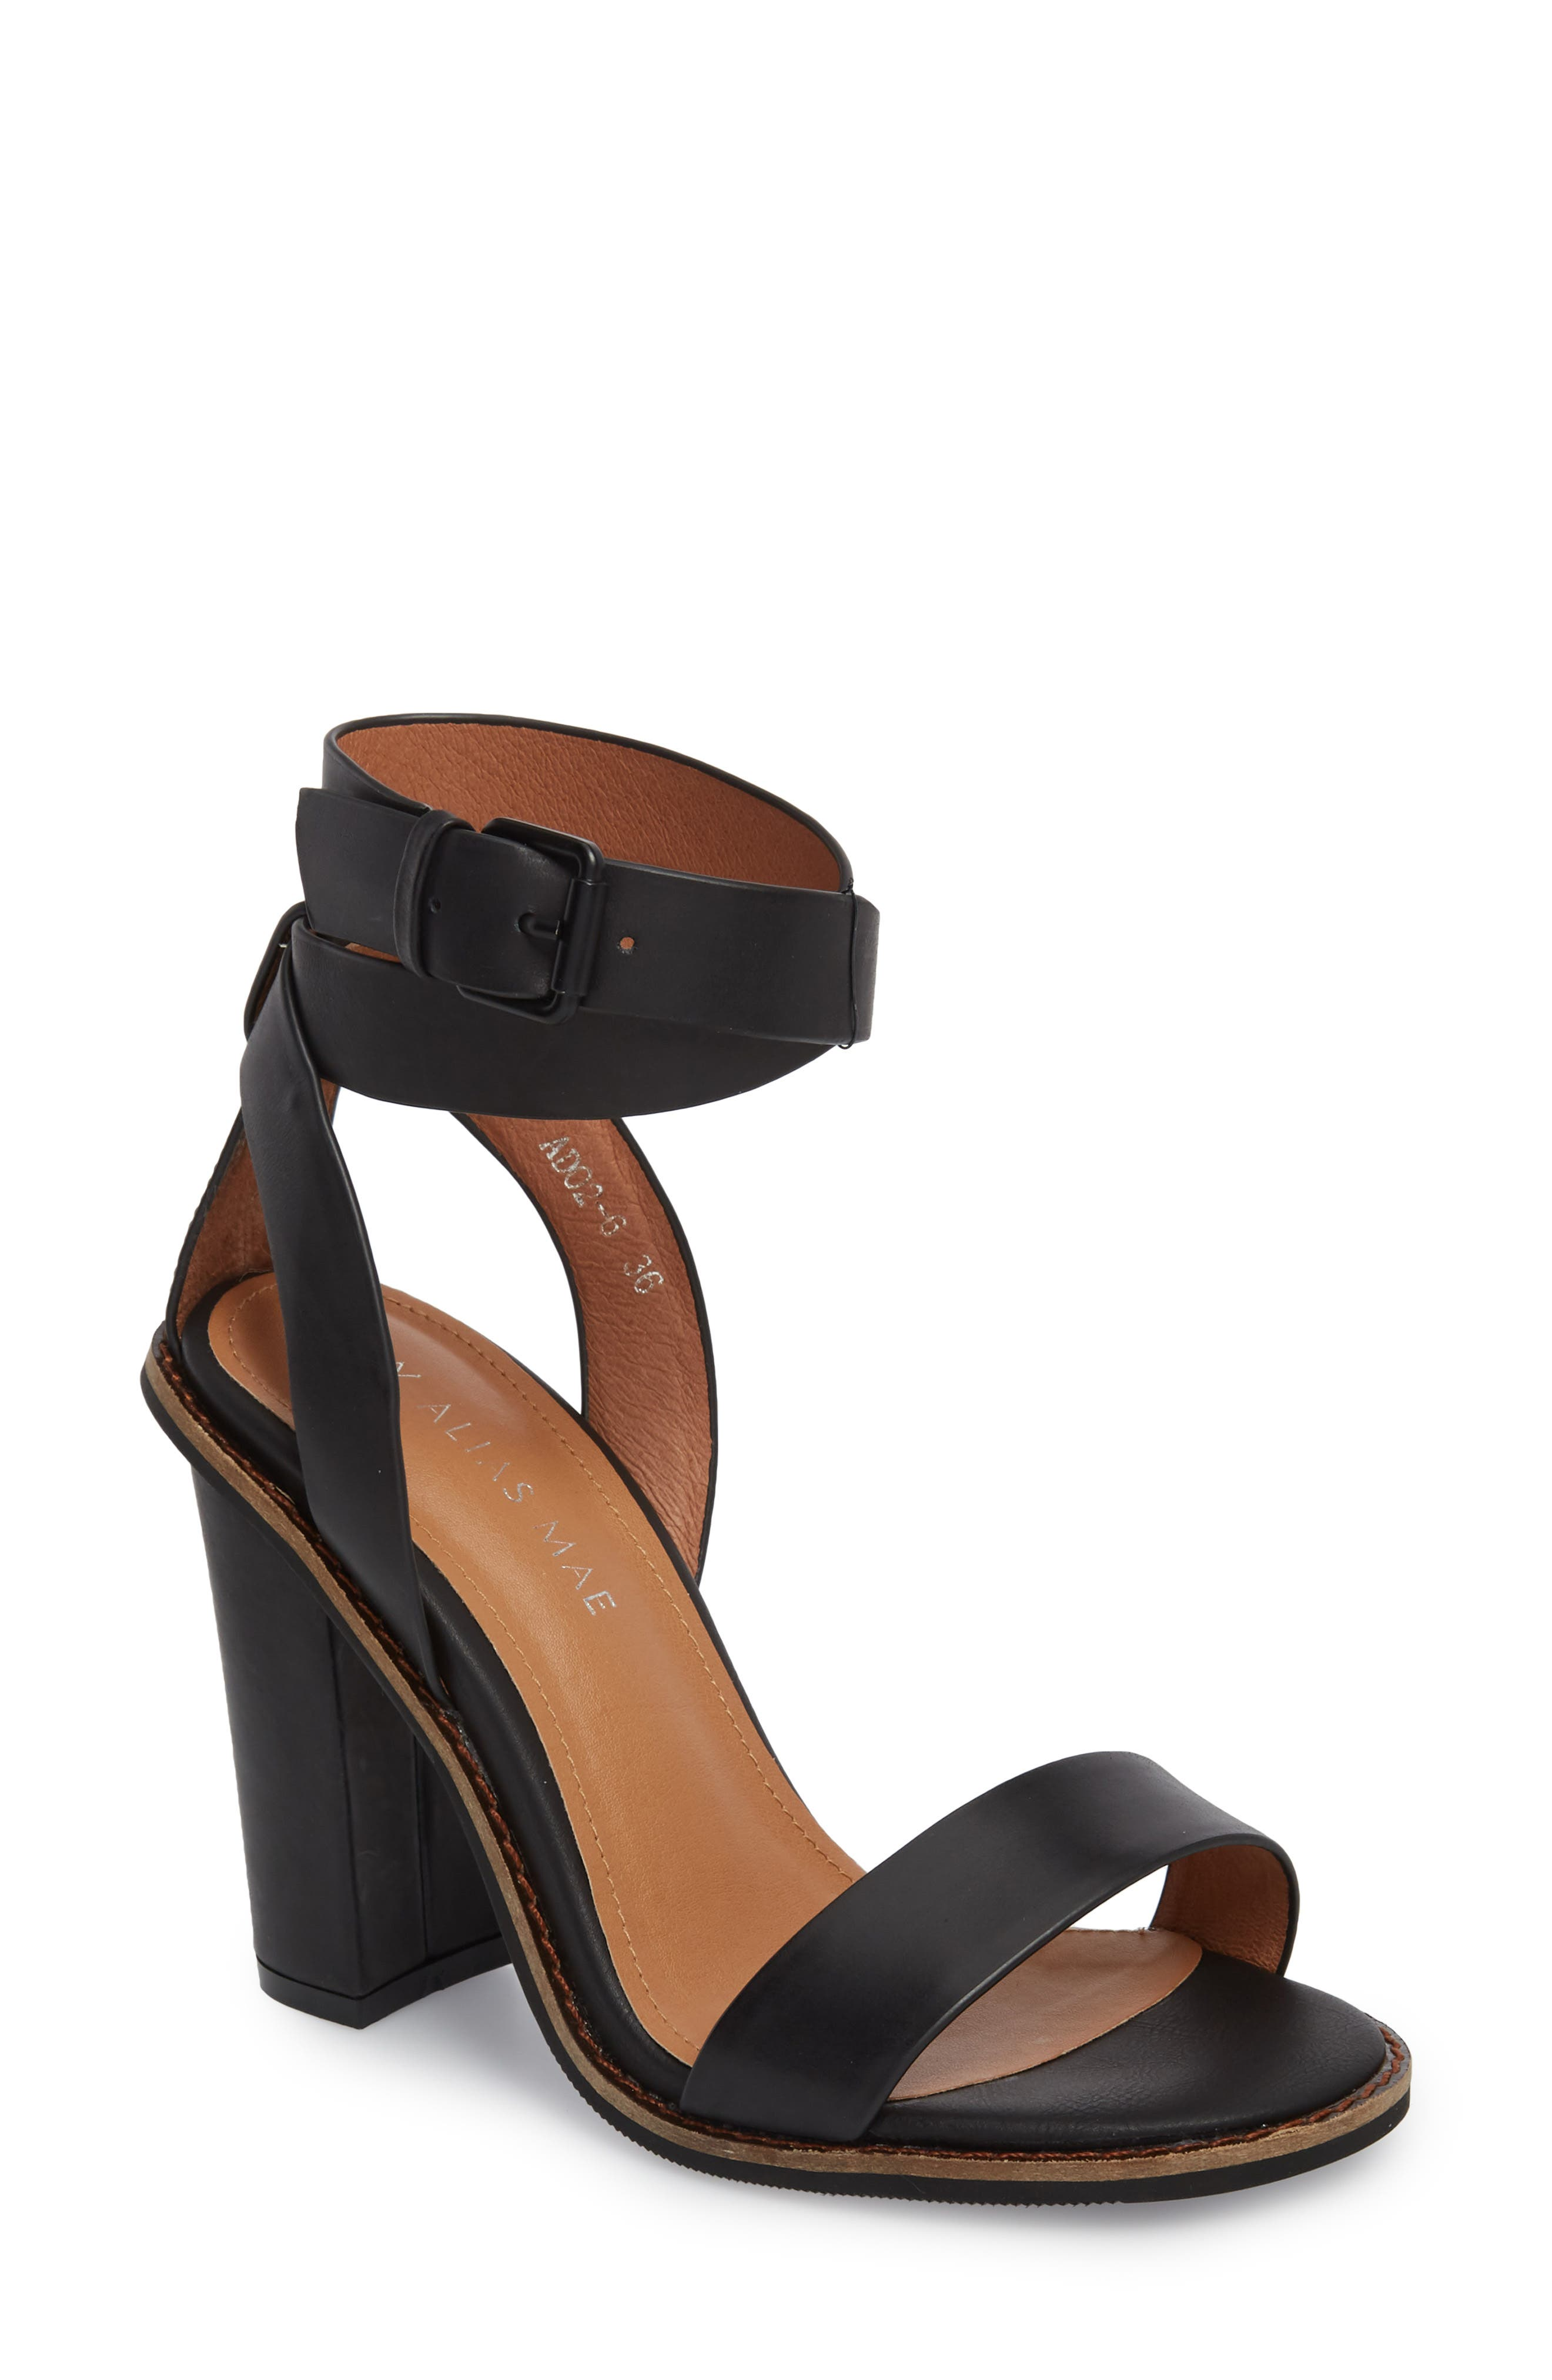 Calito Ankle Strap Sandal,                             Main thumbnail 1, color,                             001